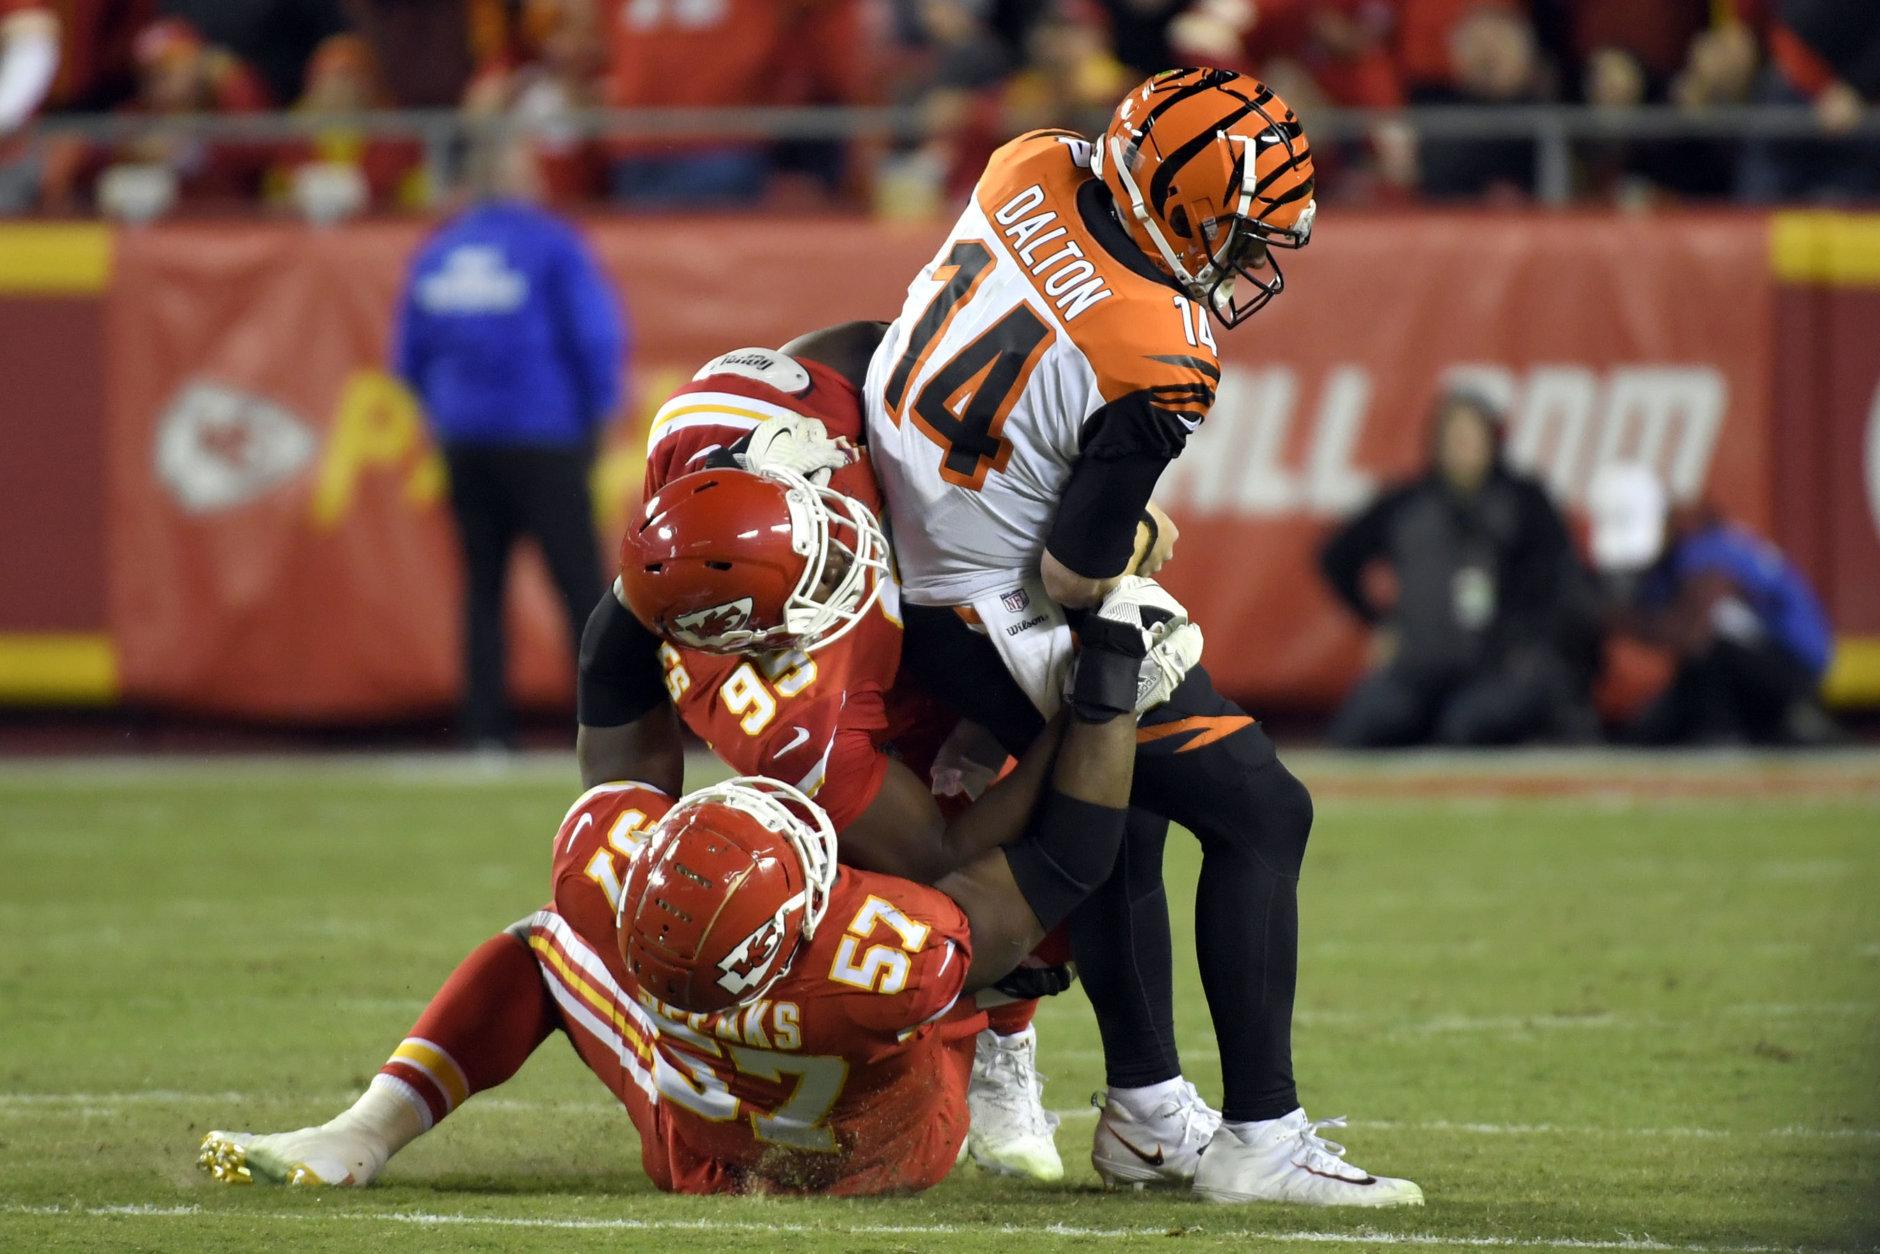 Kansas City Chiefs linebacker Breeland Speaks (57) and defensive lineman Chris Jones (95) sack Cincinnati Bengals quarterback Andy Dalton (14) during the second half of an NFL football game in Kansas City, Mo., Sunday, Oct. 21, 2018. The Chiefs won, 45-10. (AP Photo/Reed Hoffmann)